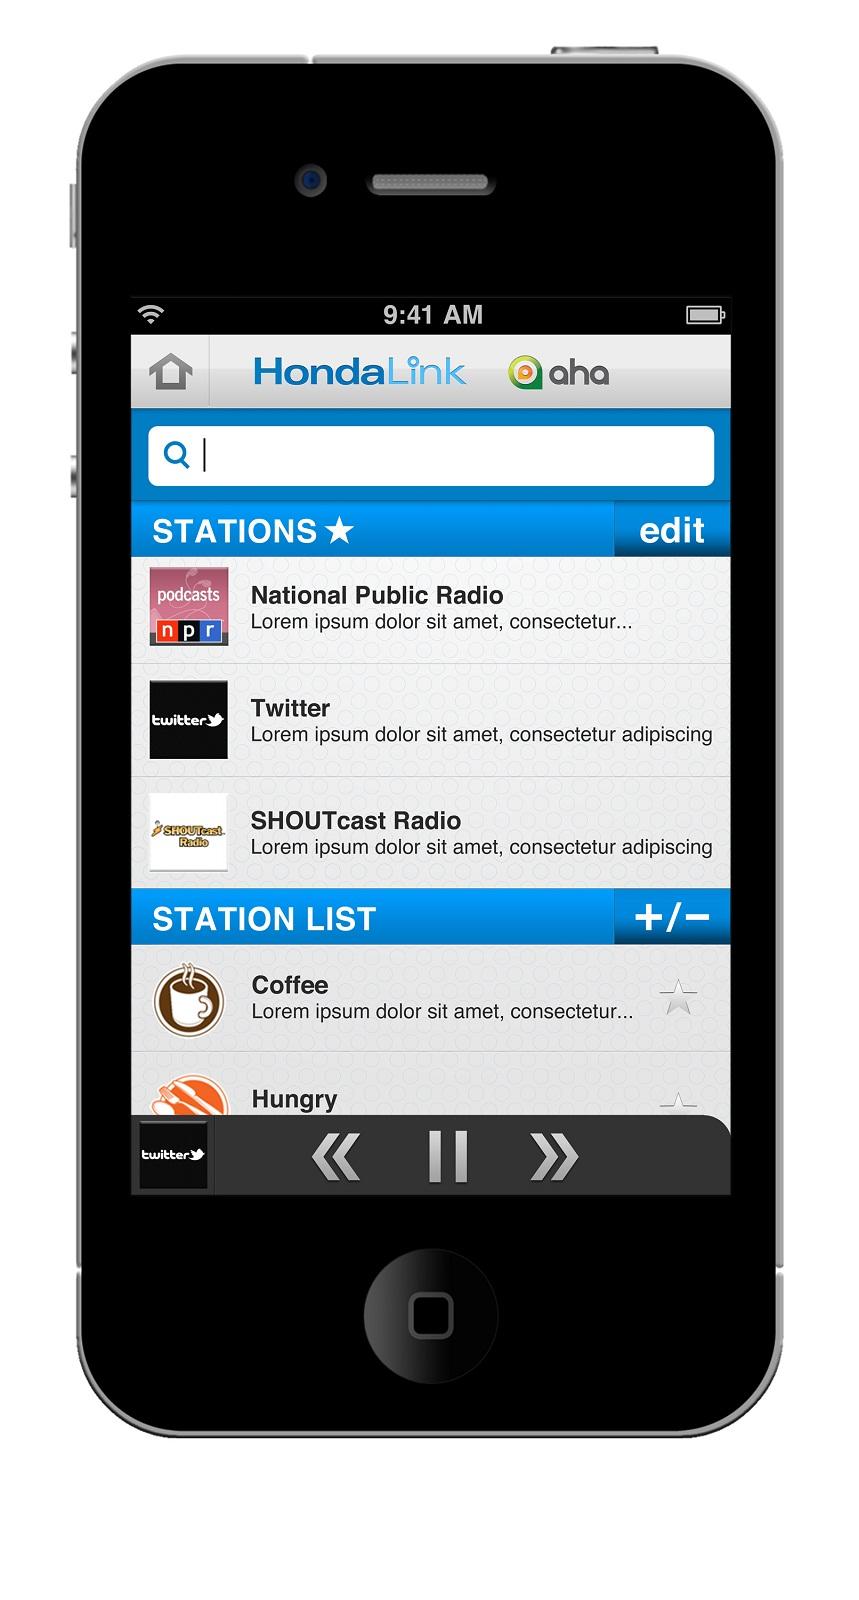 HondaLink app - list of radio stations